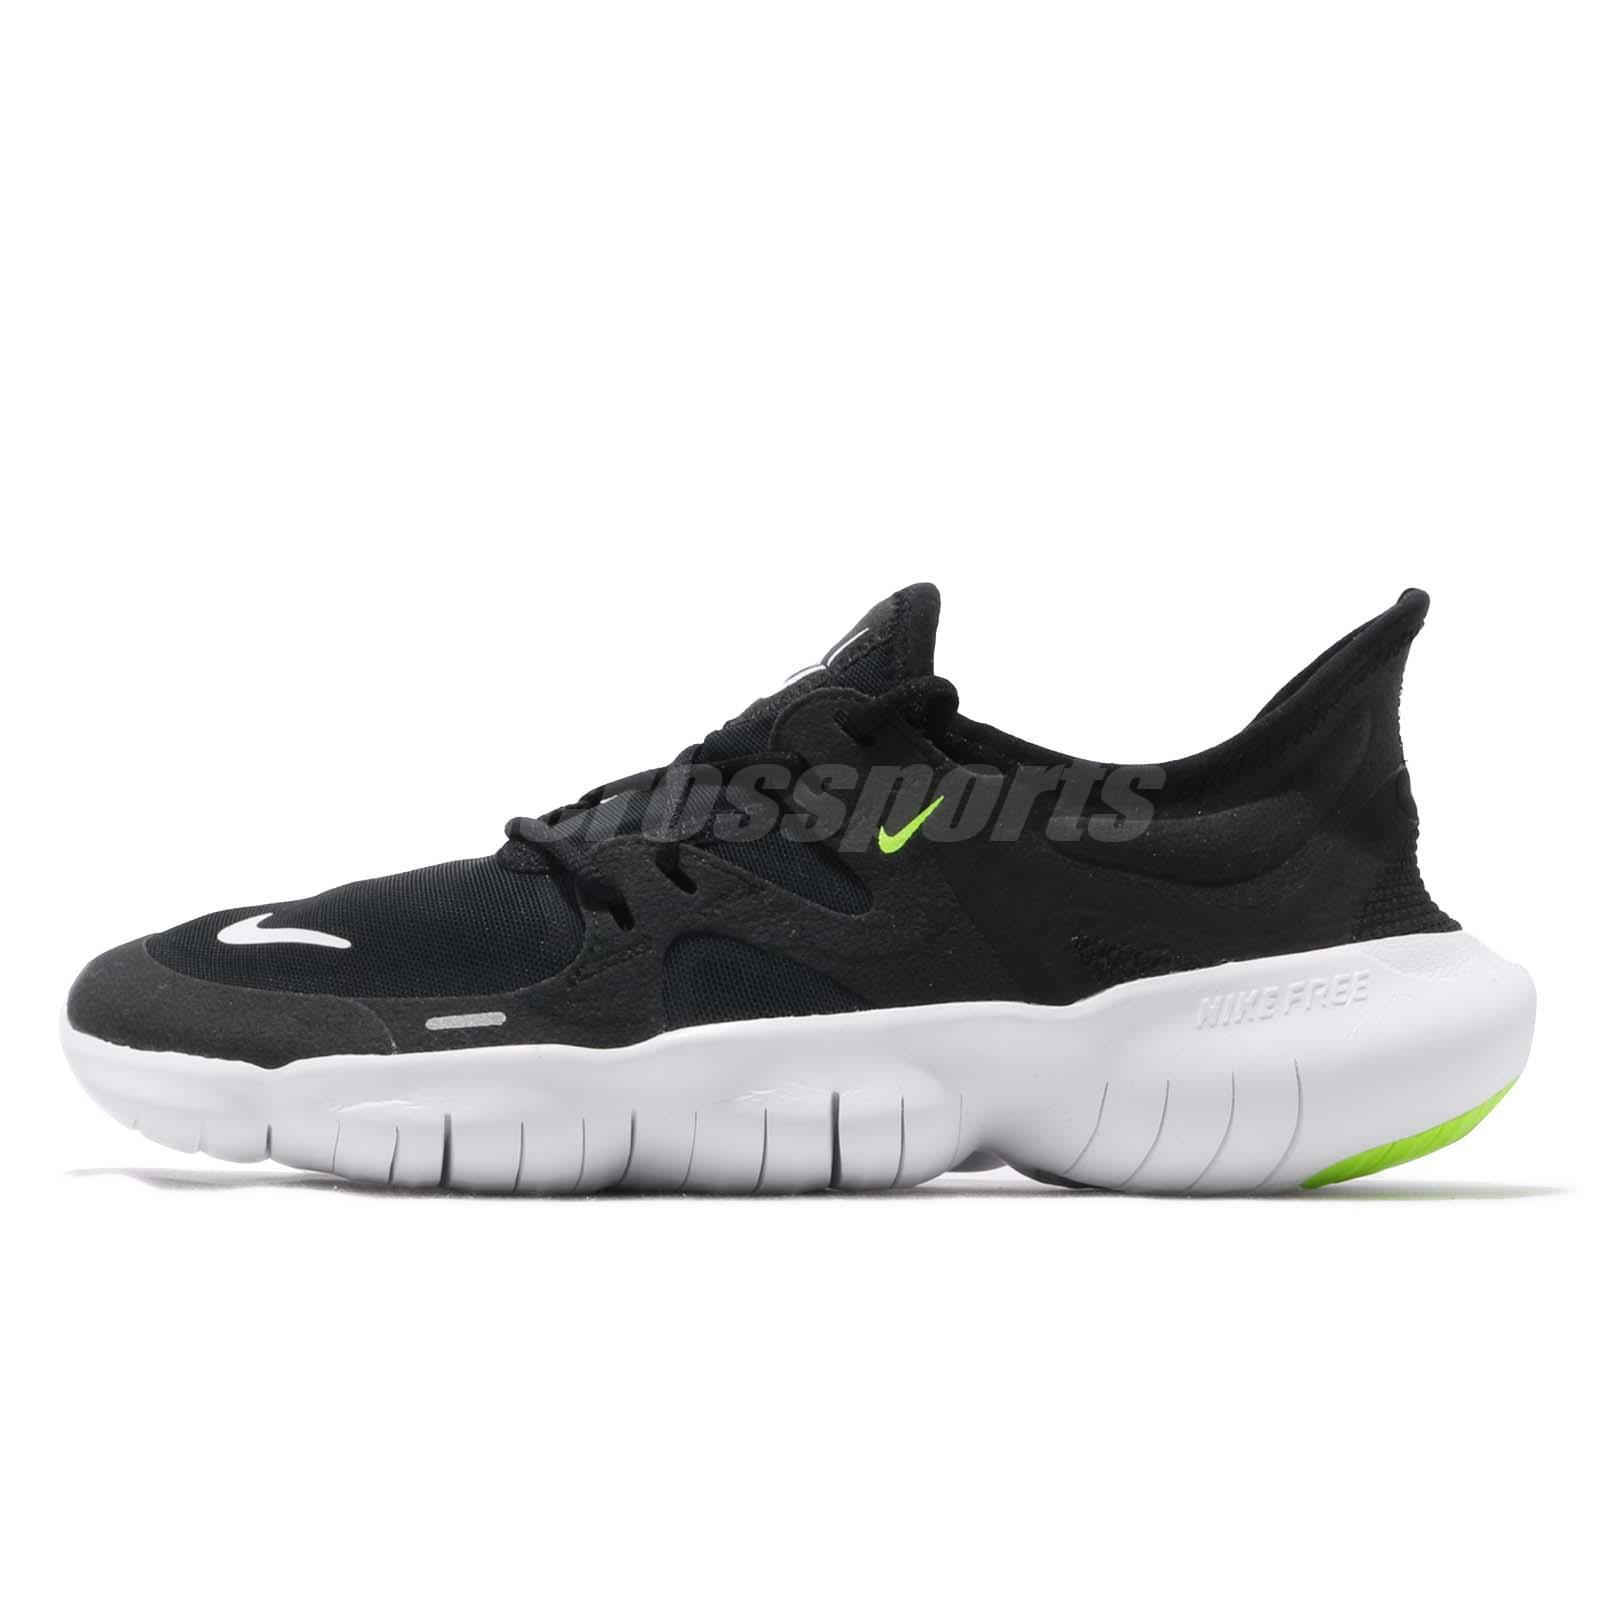 new styles 535e9 09d48 Nike Free RN 5.0 Run Black White Volt Men Running Shoes Sneakers AQ1289-003